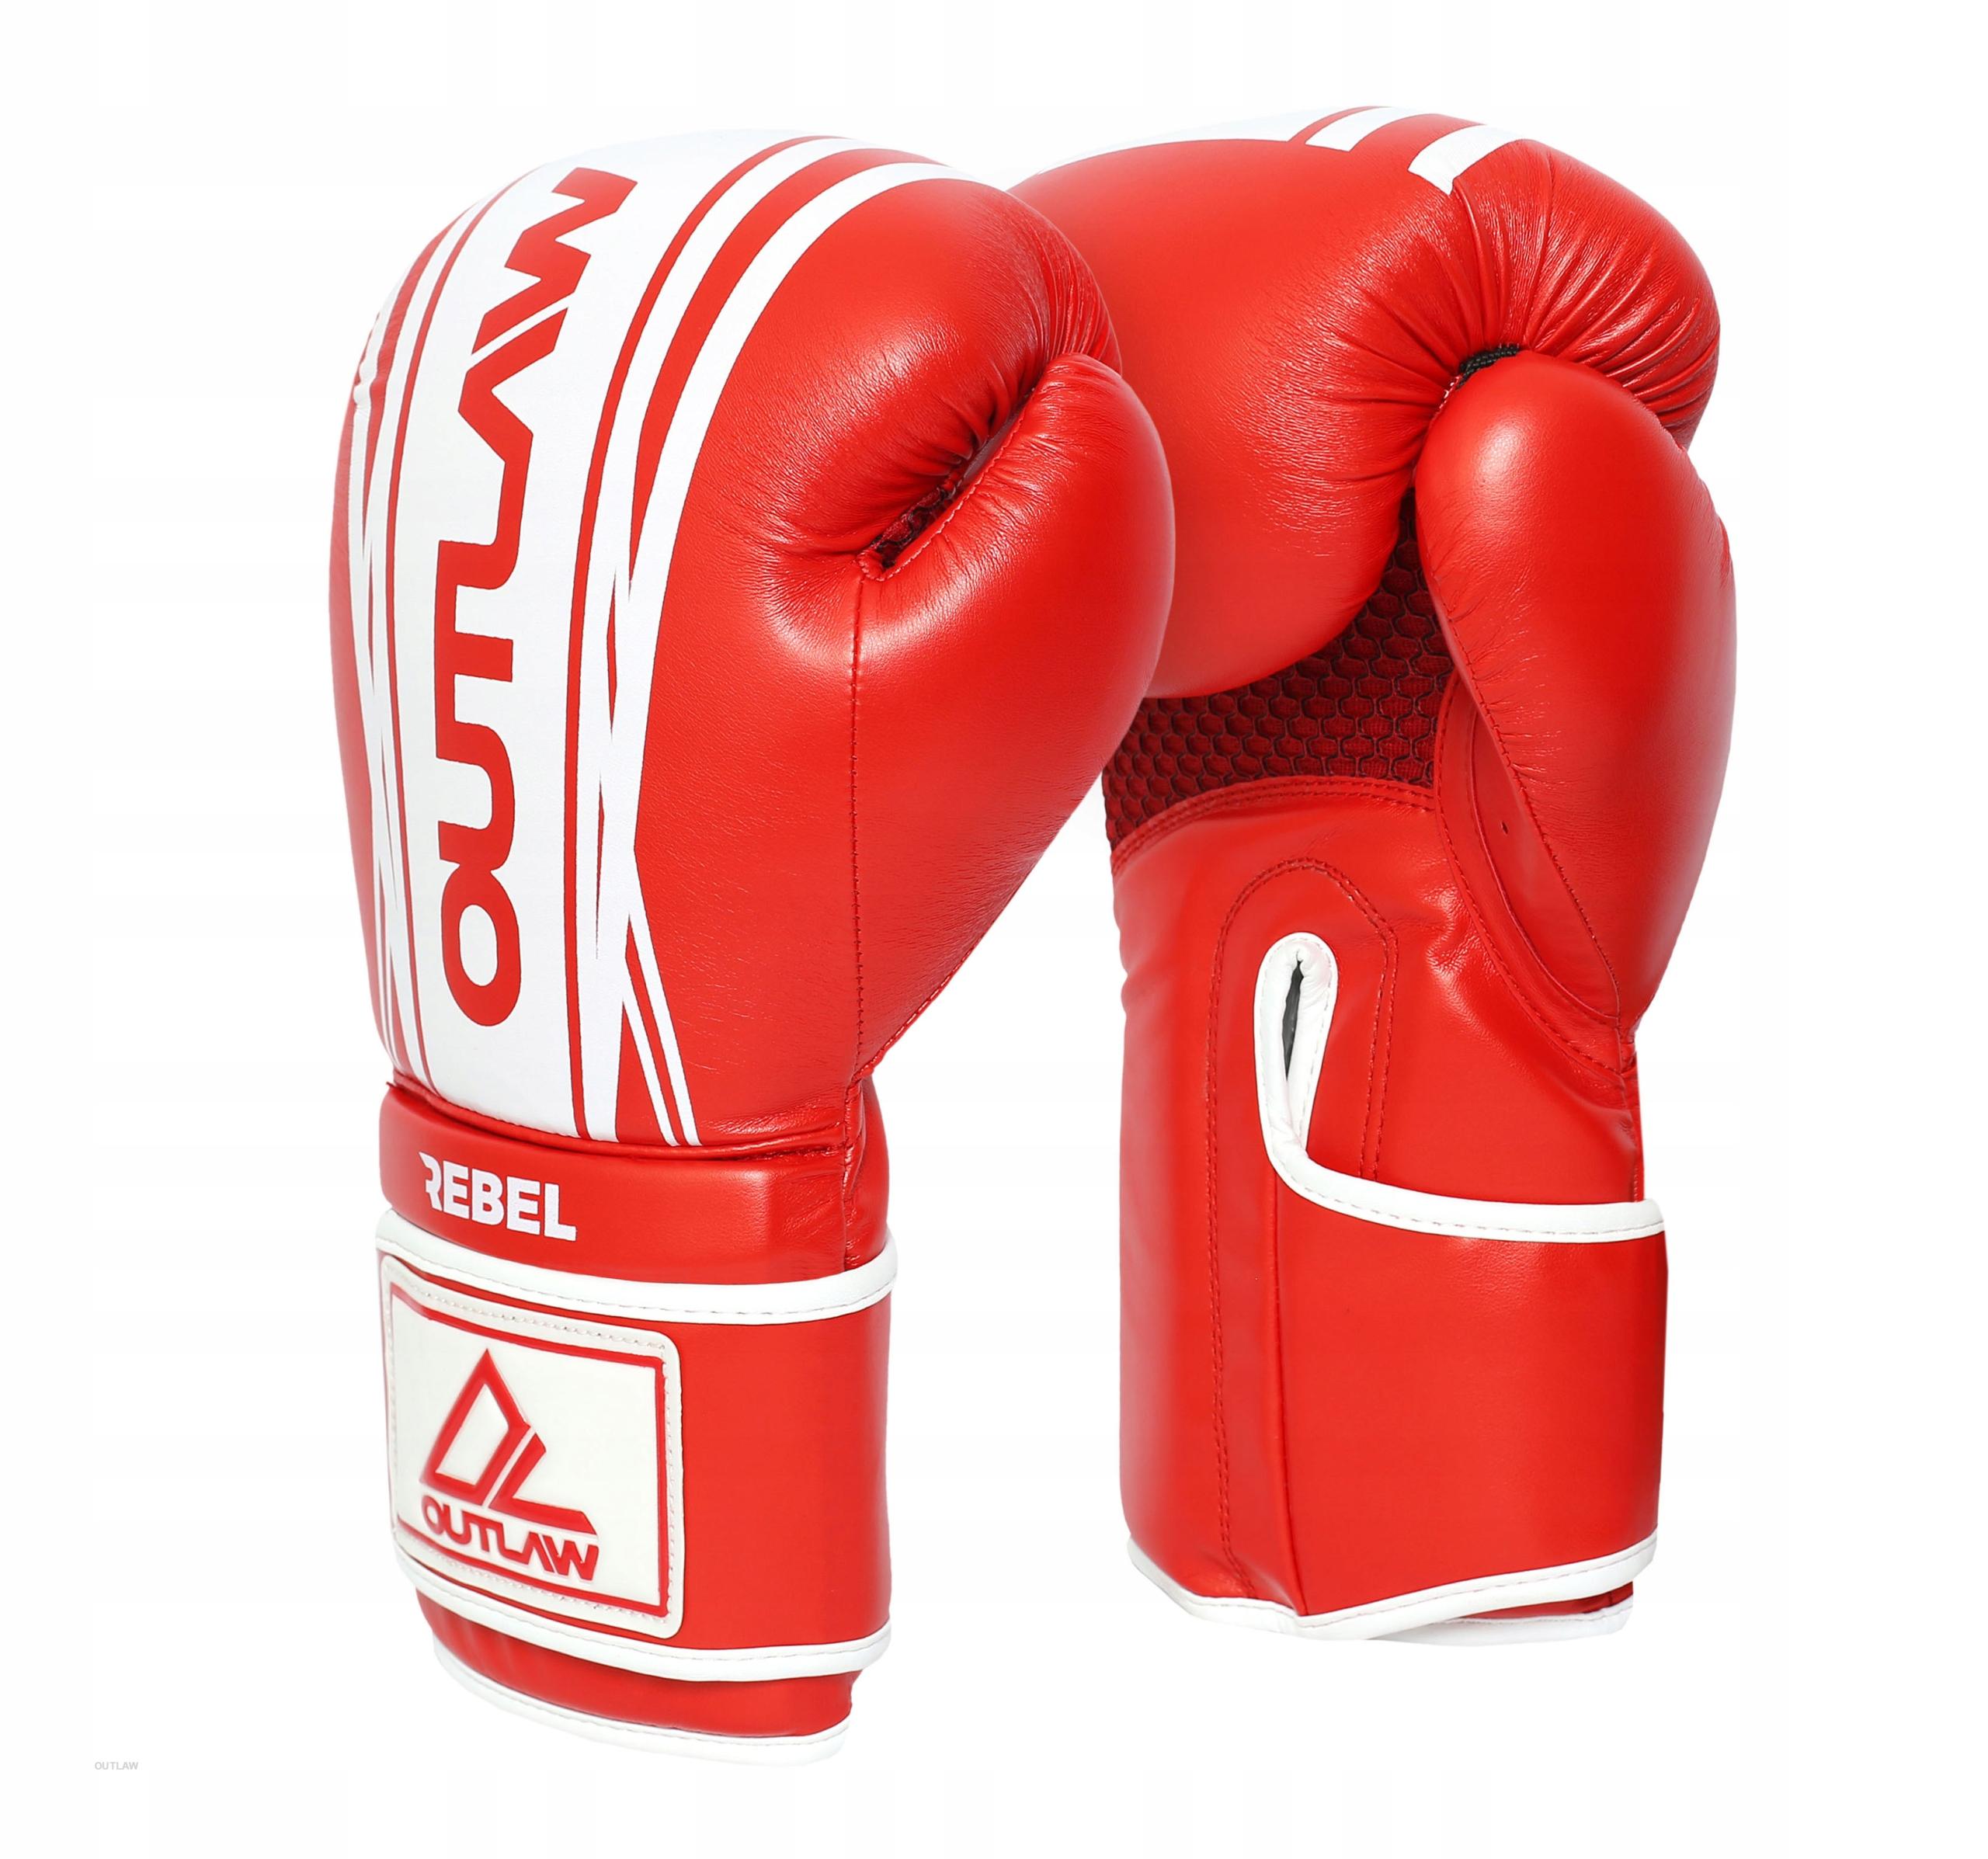 Перчатки Outlaw Boxing Rebel + Free + Free